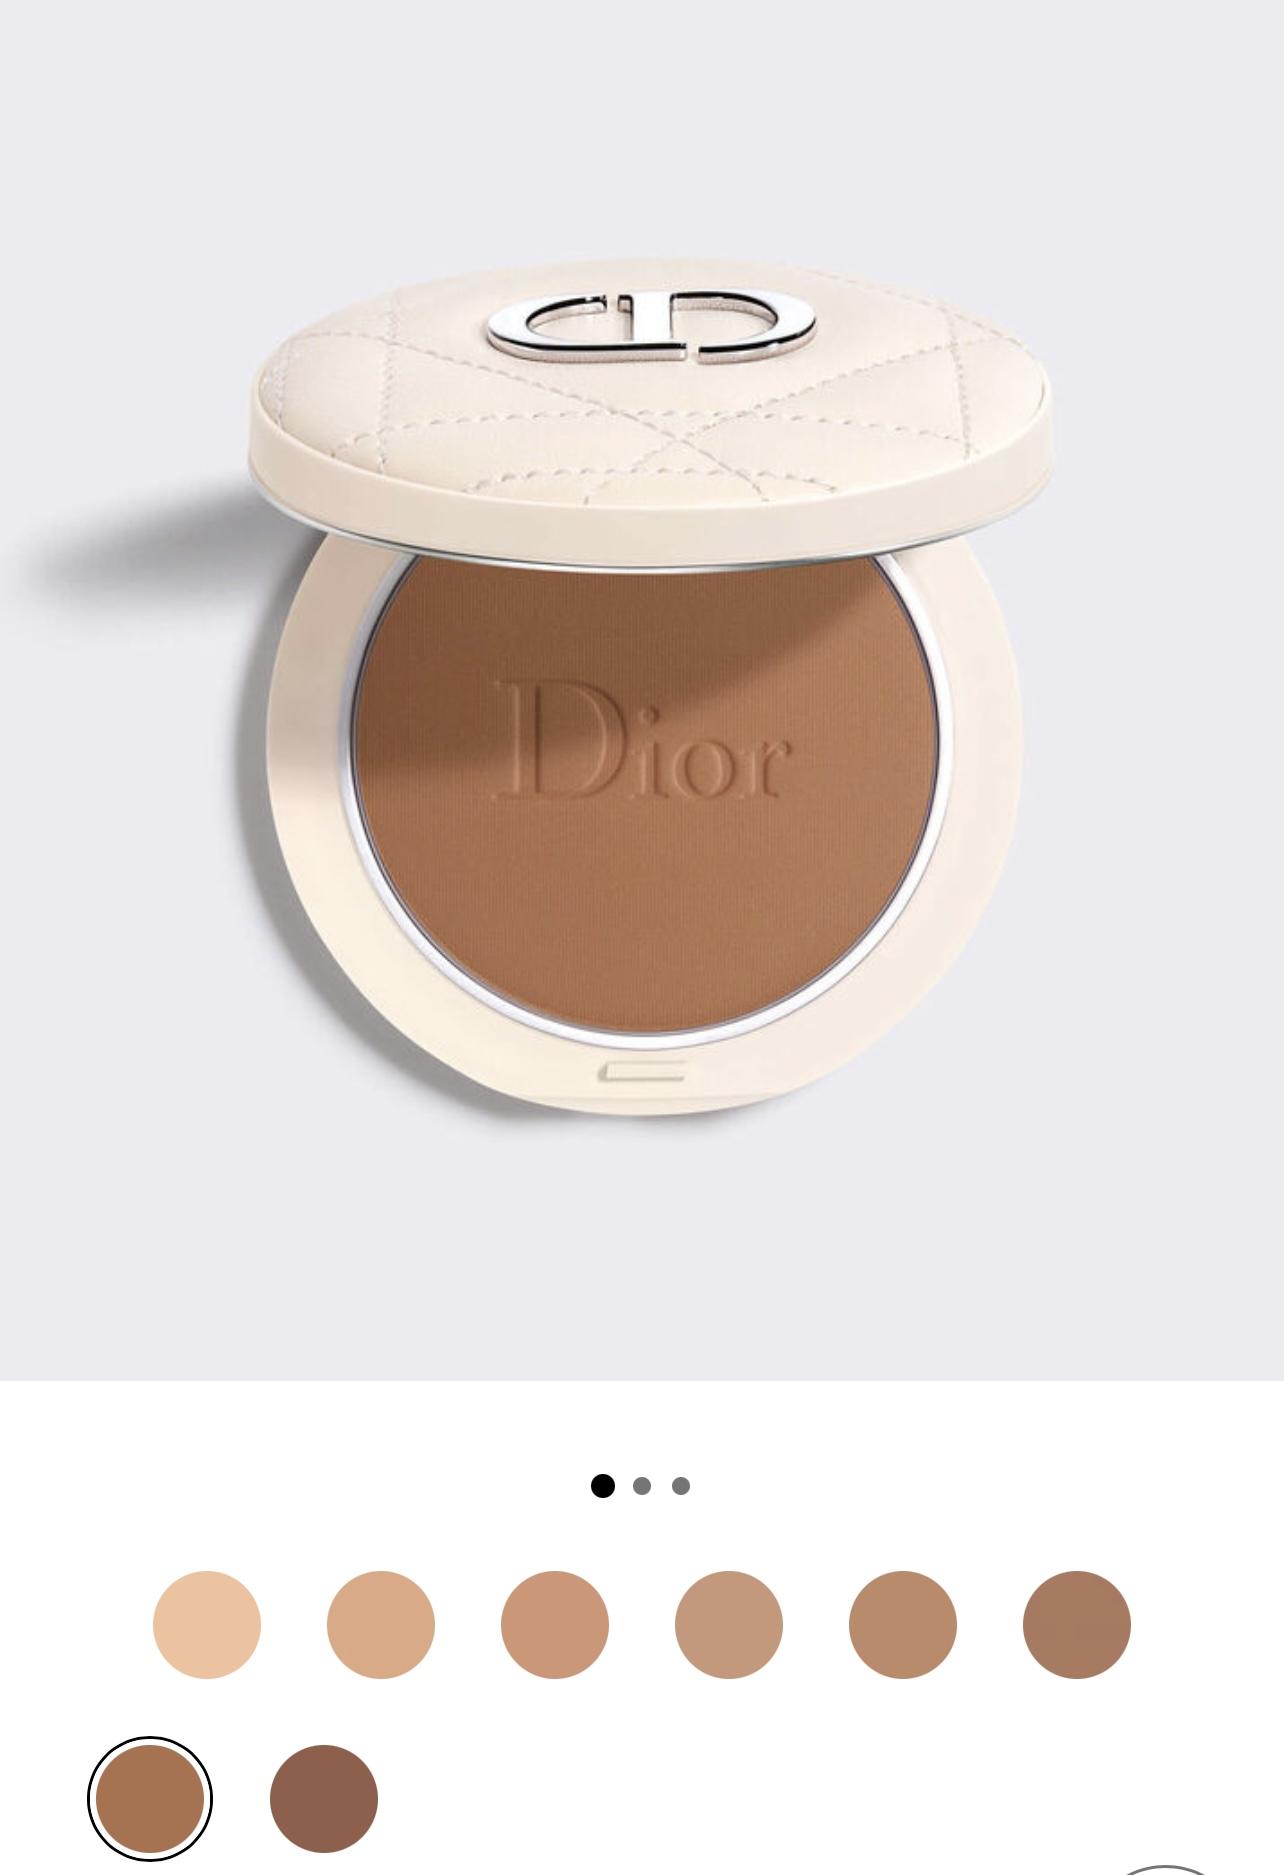 Dior Forever Natural Bronze Powder Bronzer: Natural Glow | DIOR